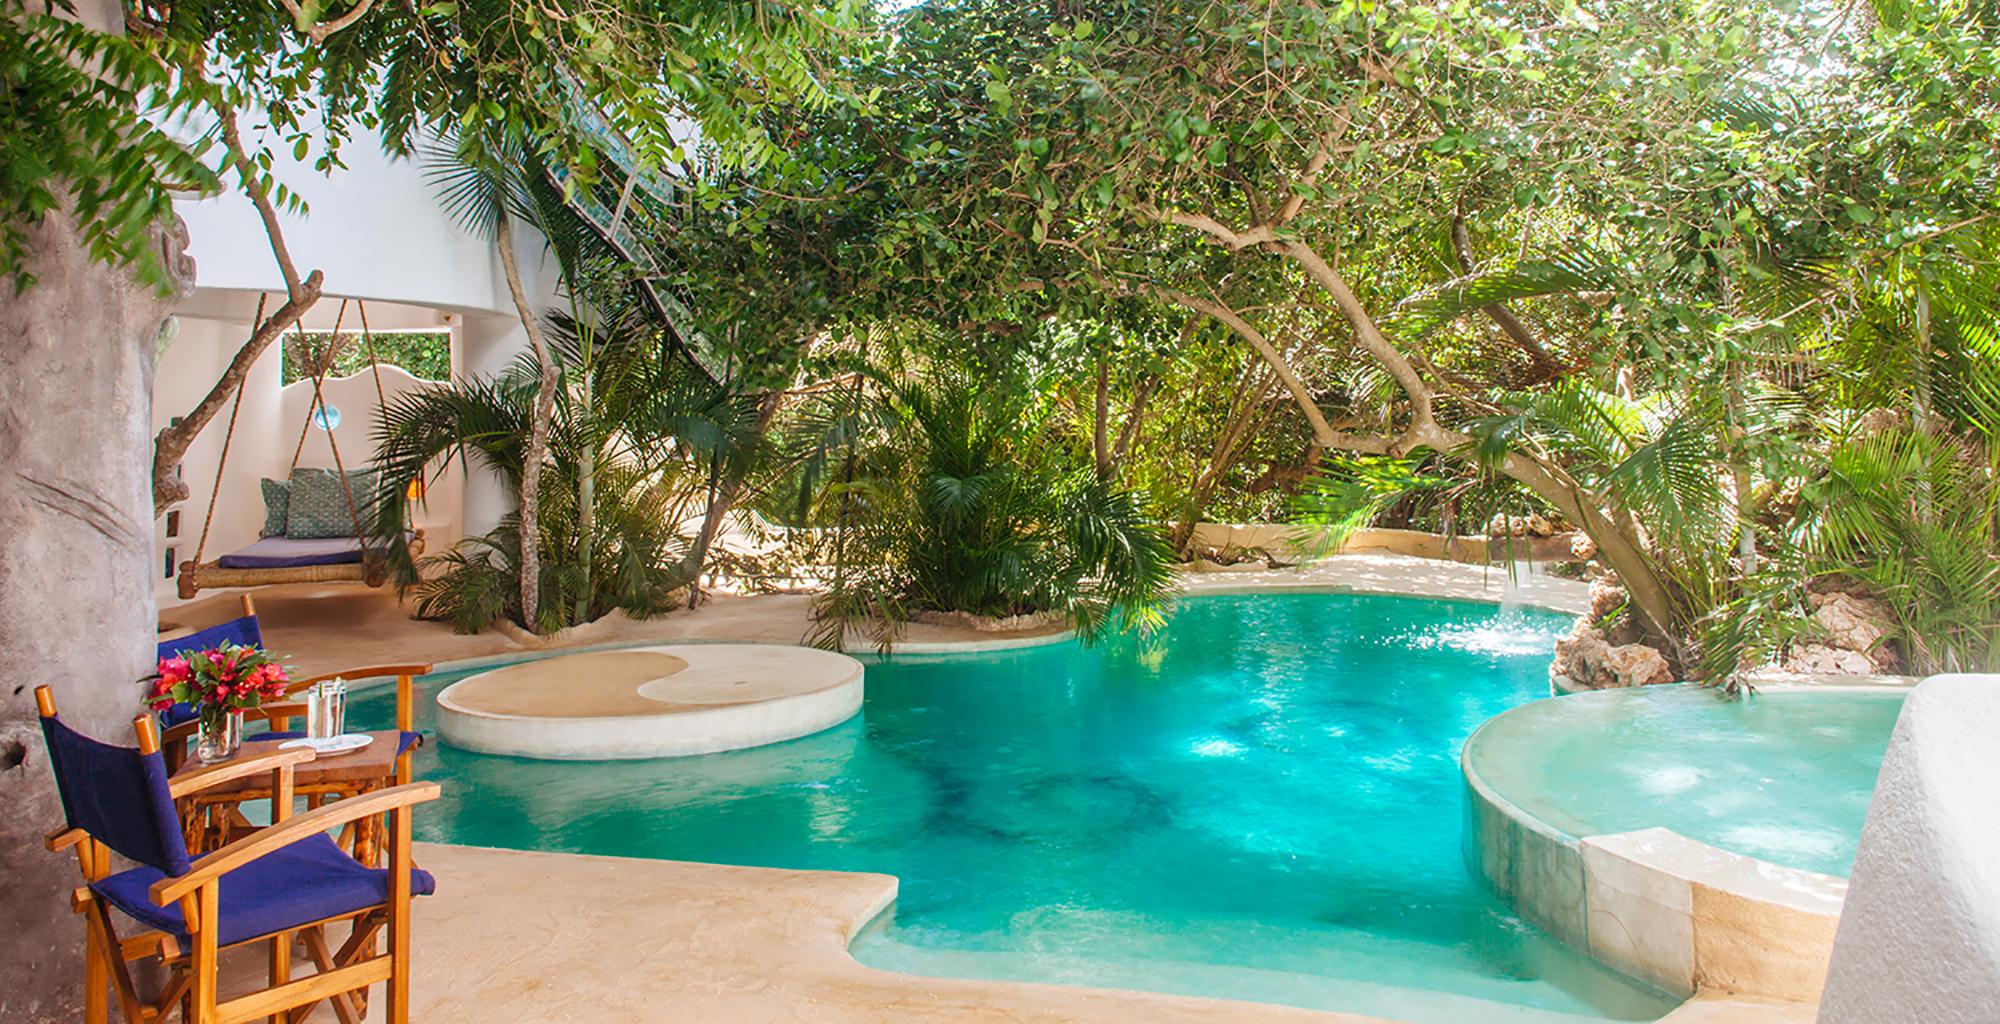 Kenya-Watamu-Treehouse-Swimming-Pool